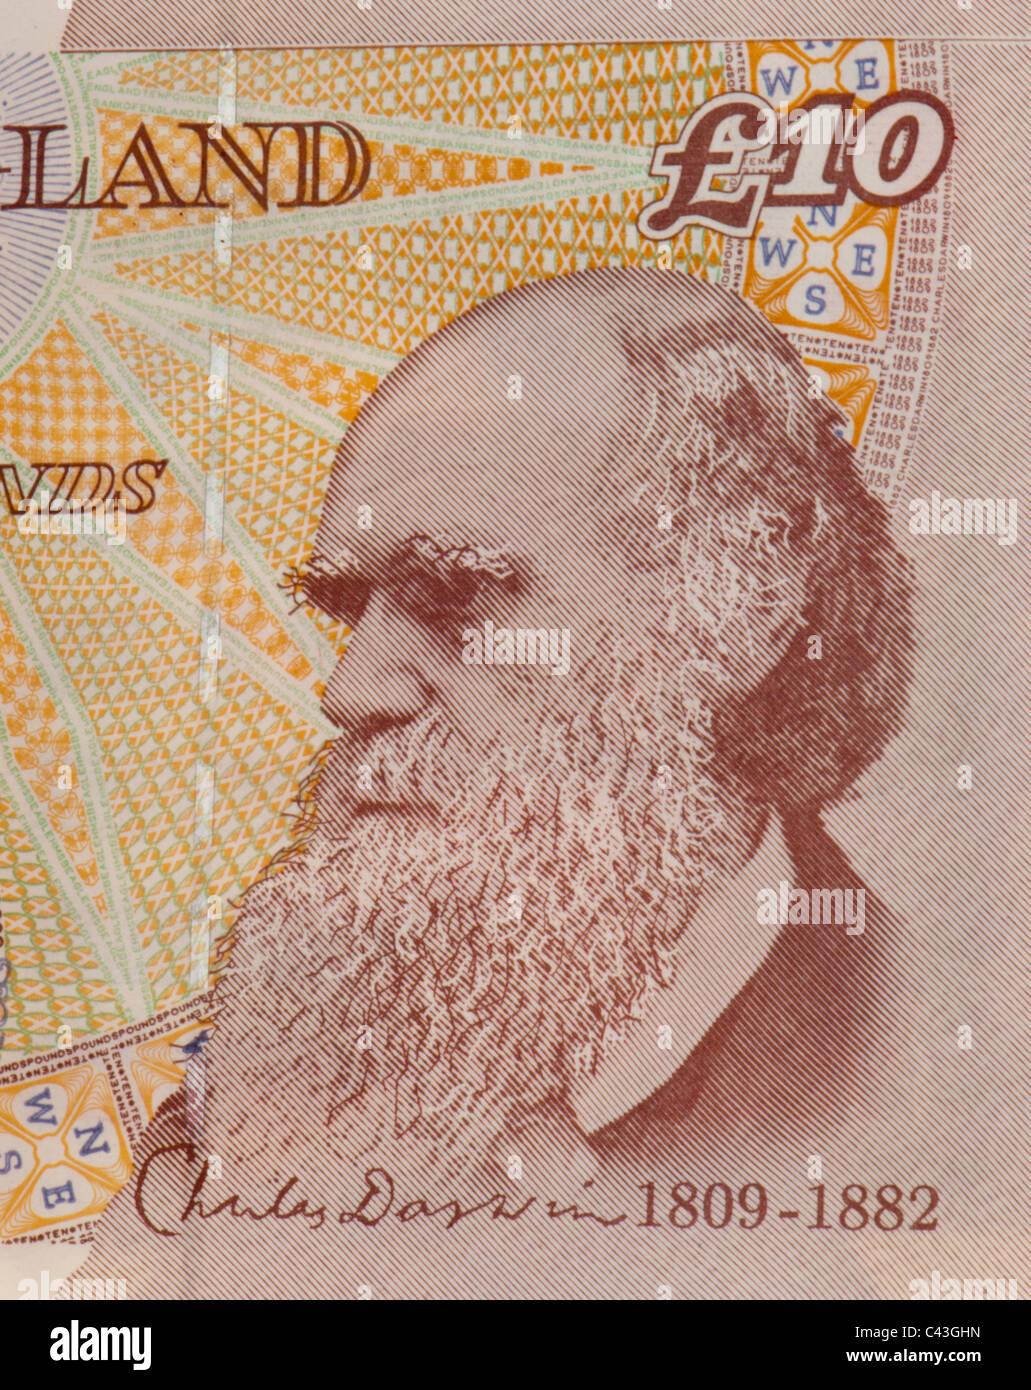 UK 10 pound showing head of Charles Darwin - Stock Image